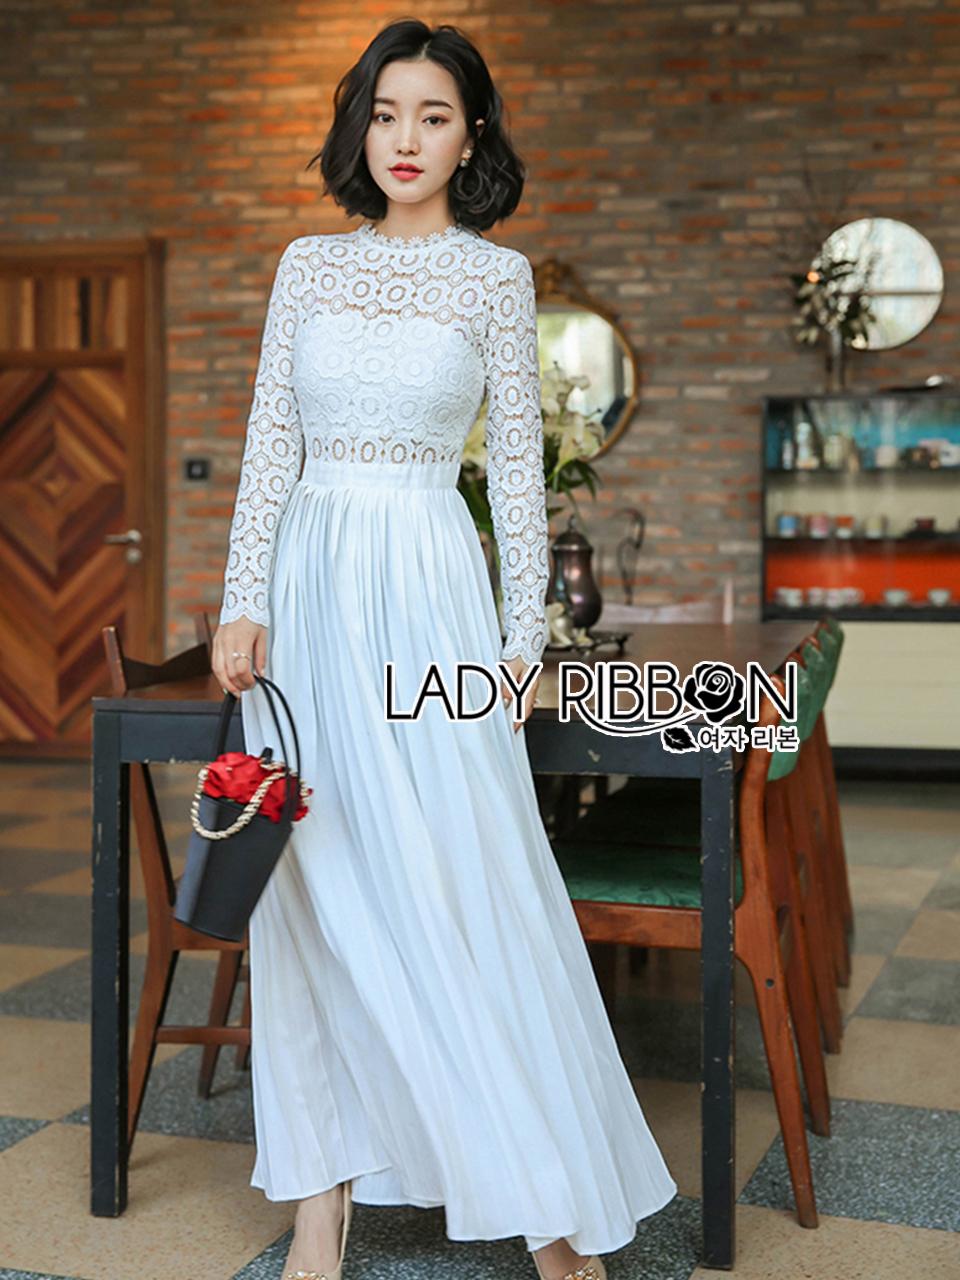 66a5a5656c Lady Ribbon s Made 🎀 Self-Portrait Pleated Crochet Floral Maxi Dress  เดรสผ้าลูกไม้